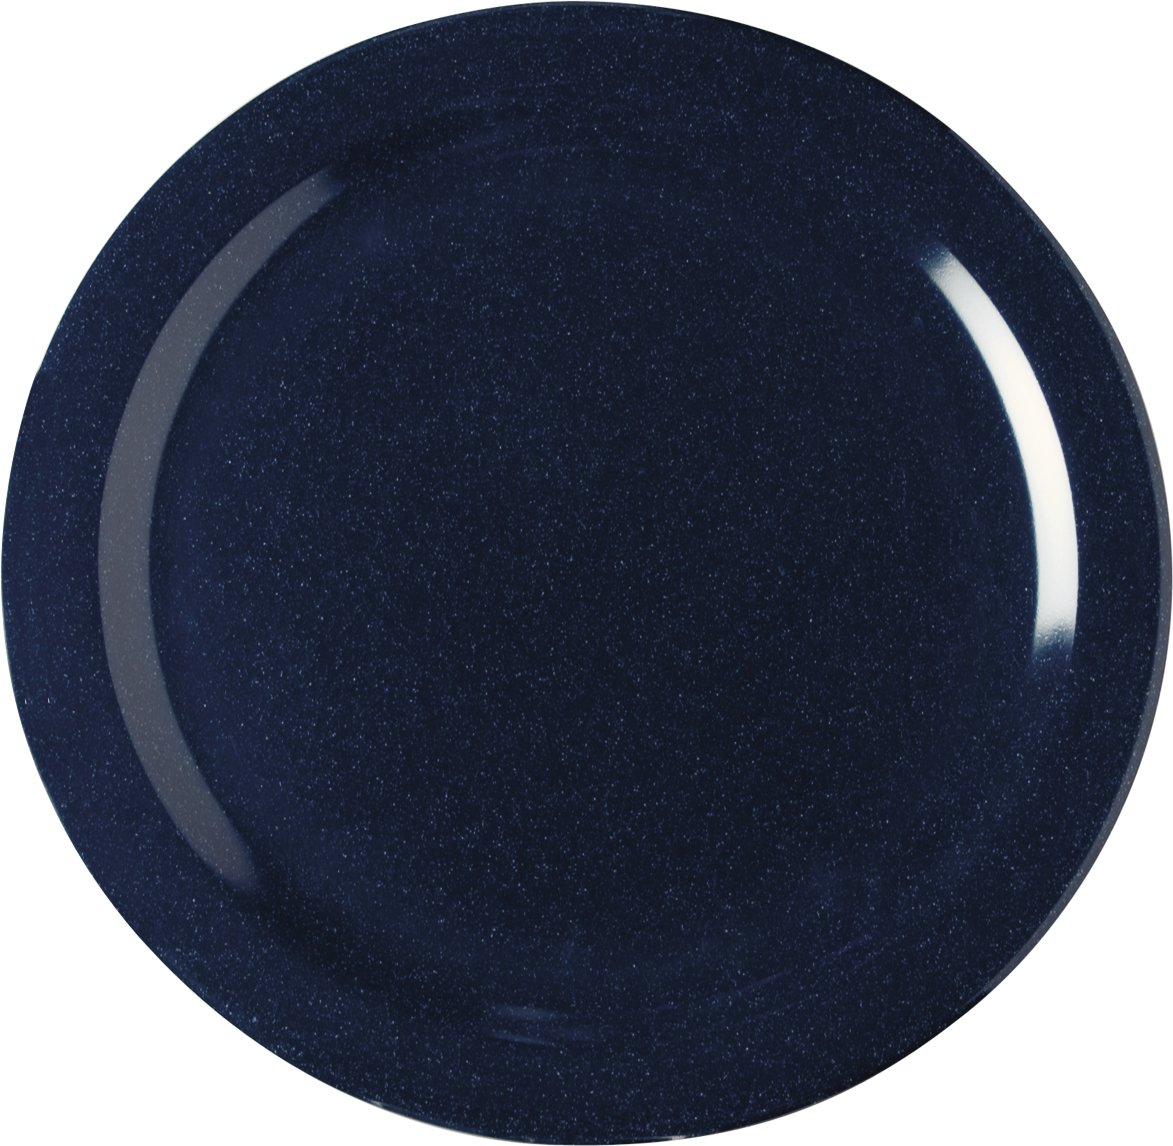 Carlisle 4350035 Dallas Ware Melamine Dinner Plate, 10.20'' Dia. x 0.84'' H, Cafe Blue (Case of 48) by Carlisle (Image #9)